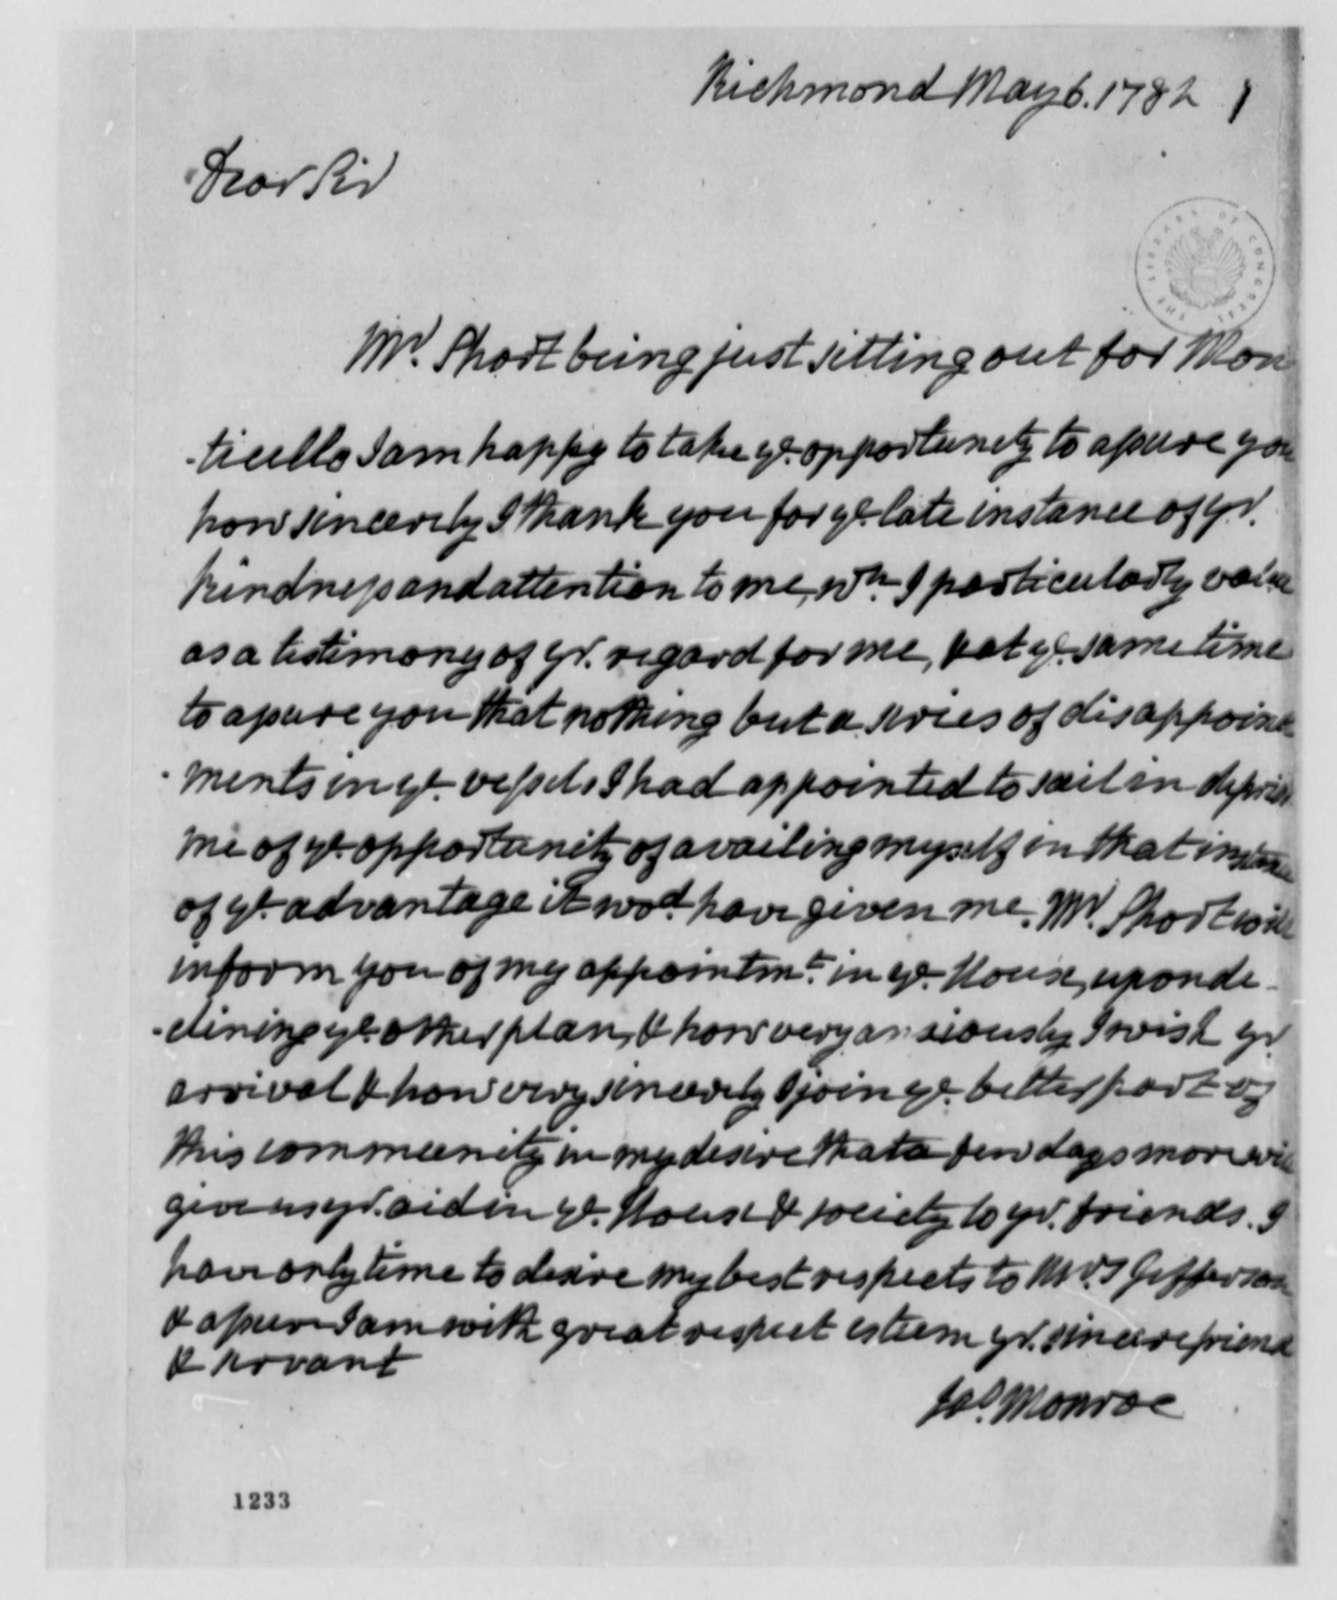 James Monroe to Thomas Jefferson, May 6, 1782